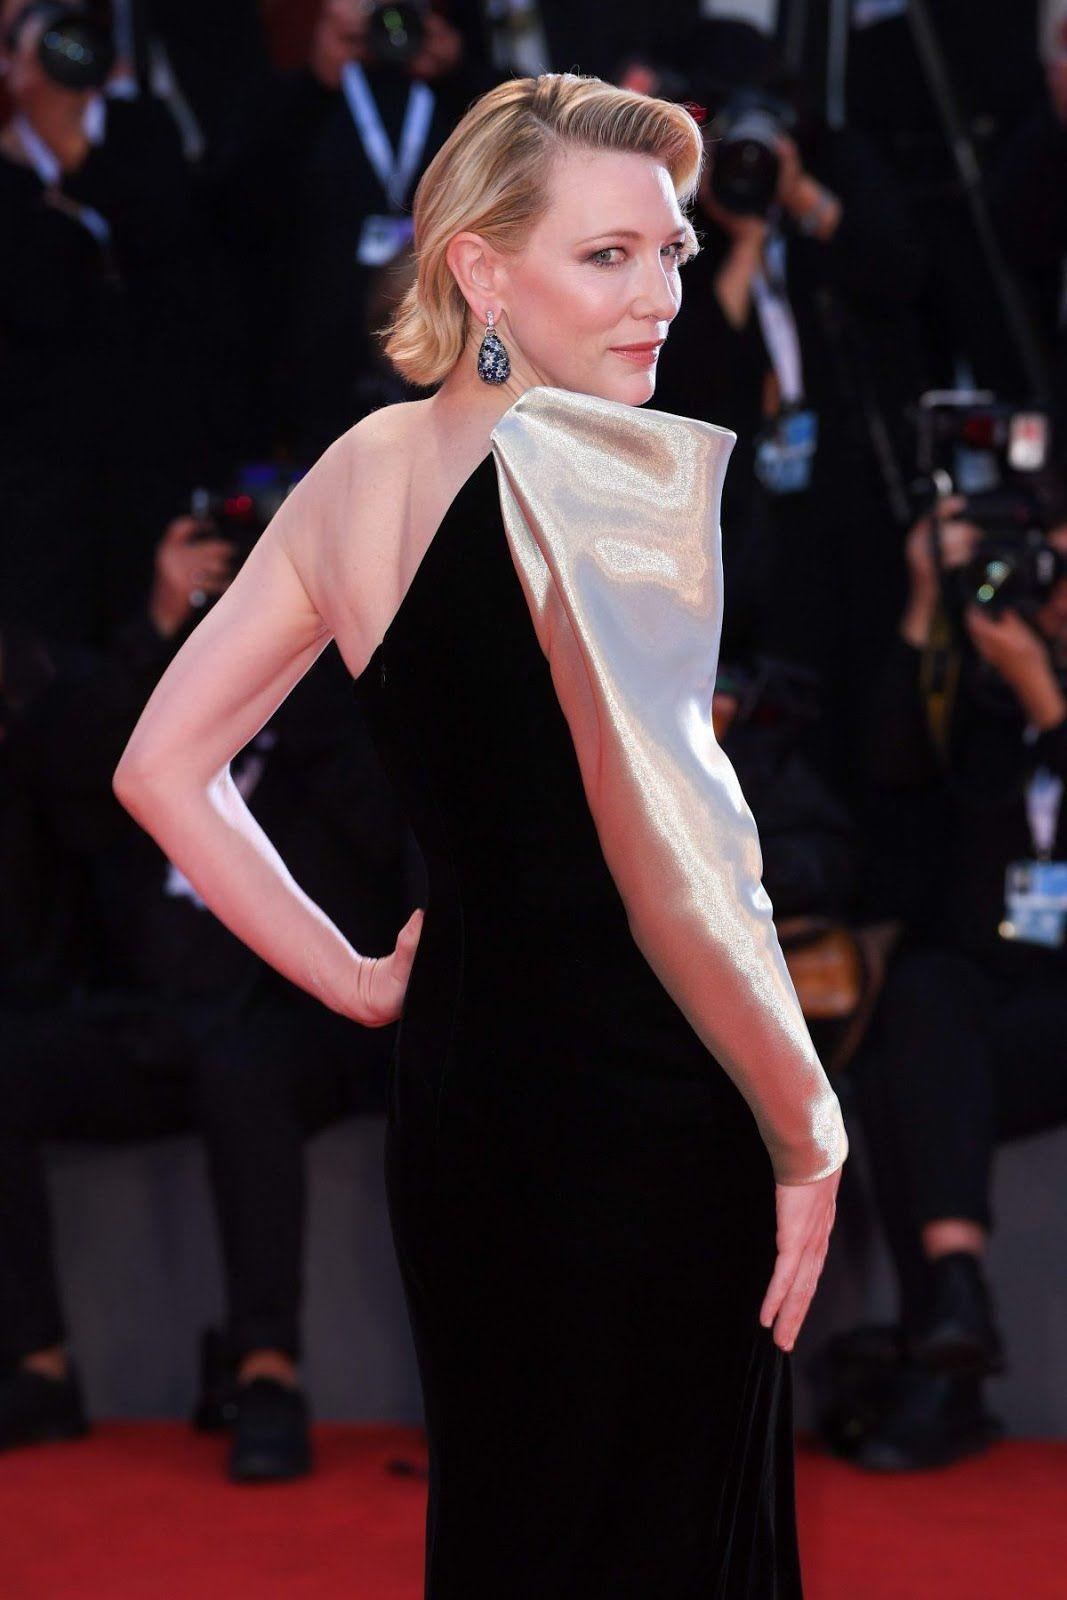 OLD HOT Cate Blanchett At Suspiria Premiere At 2018